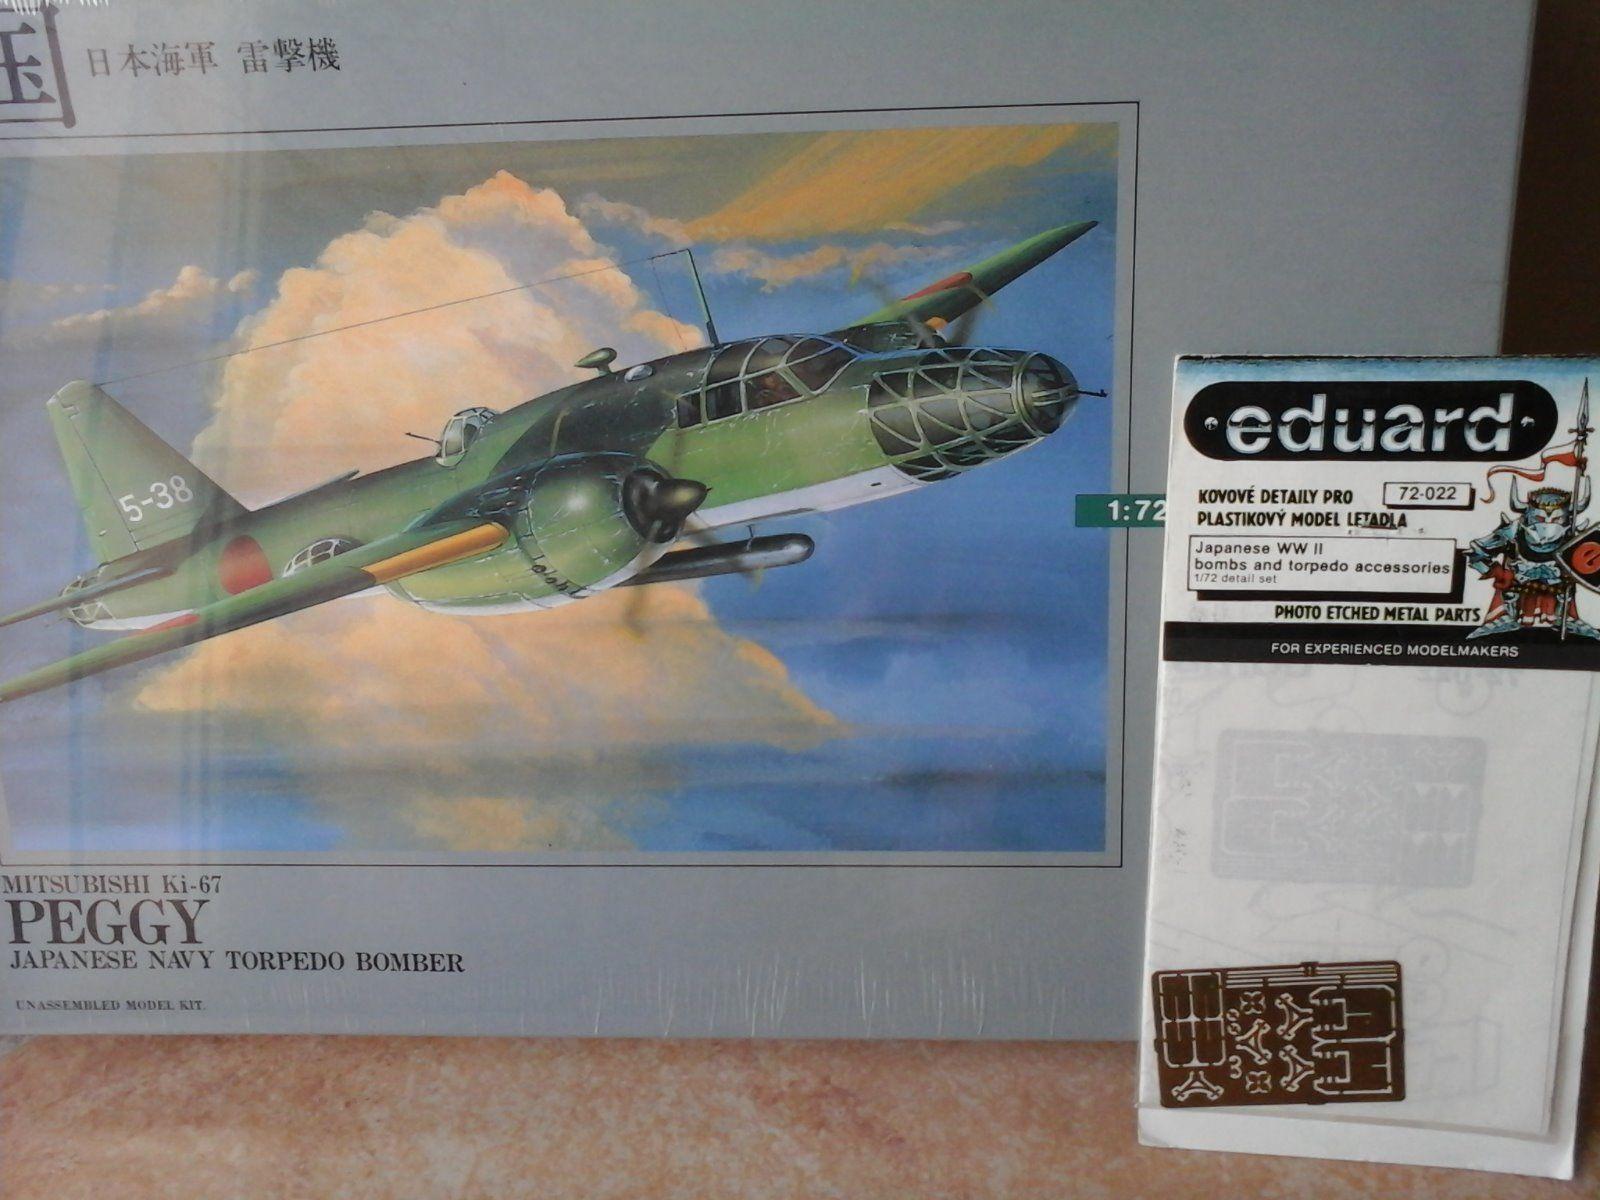 garantizado MITSUBISHI KI47  PEGGY  TORPEDO BOMBER 1 1 1 72 SCALE ARII MODEL JAPAN+PHOTOETCHED P  punto de venta en línea